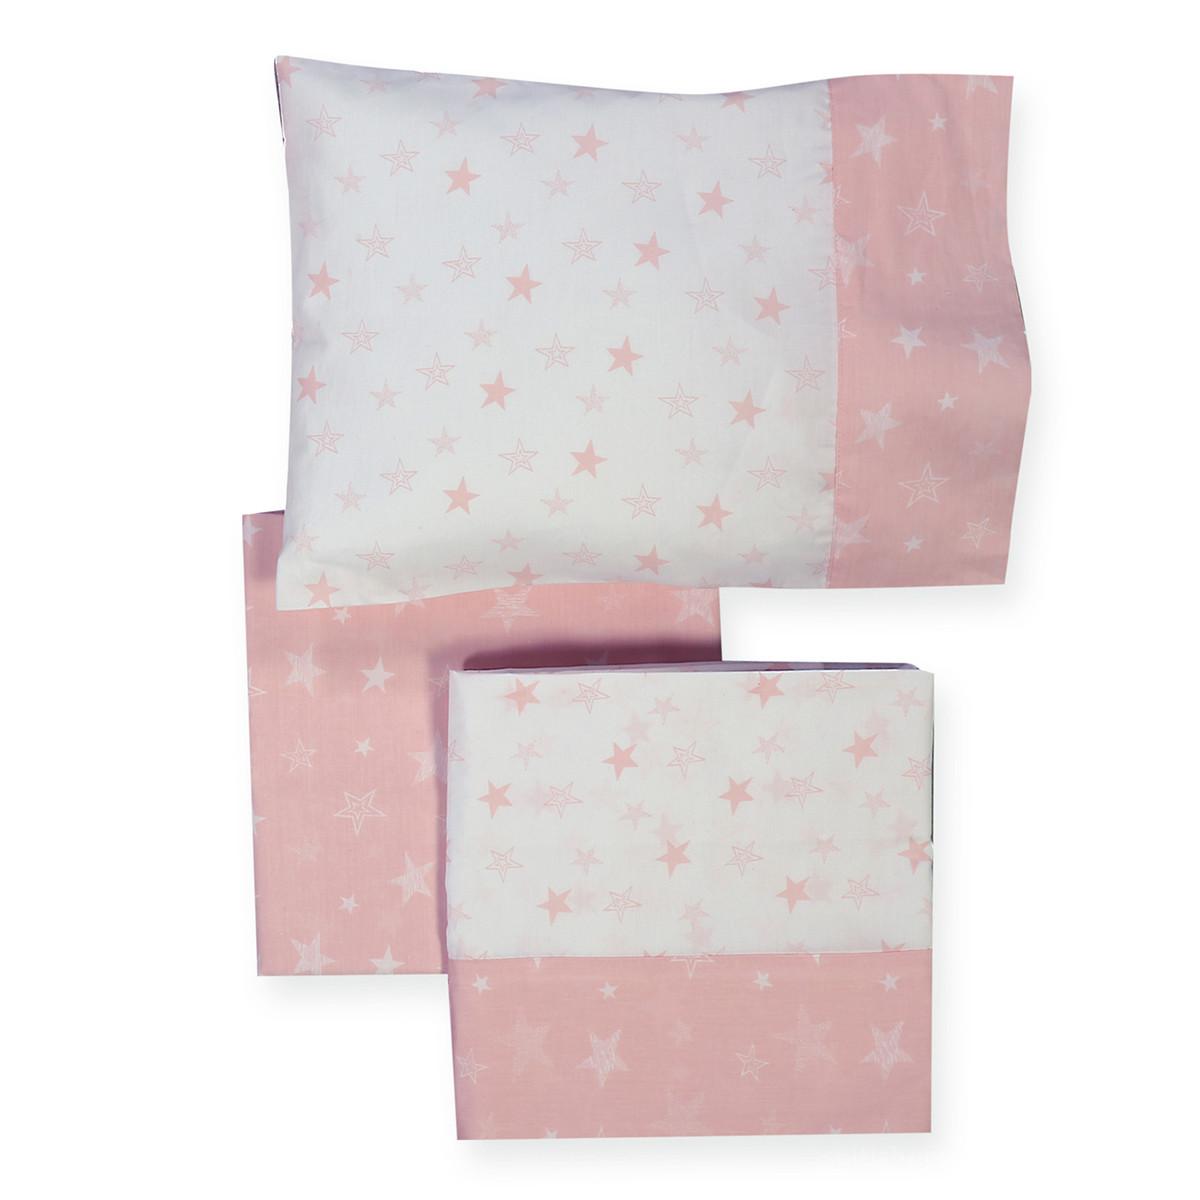 e8f43c99f3f -10% Spiti Shop Σεντόνια Κούνιας (Σετ) Nef-Nef Moon Pink